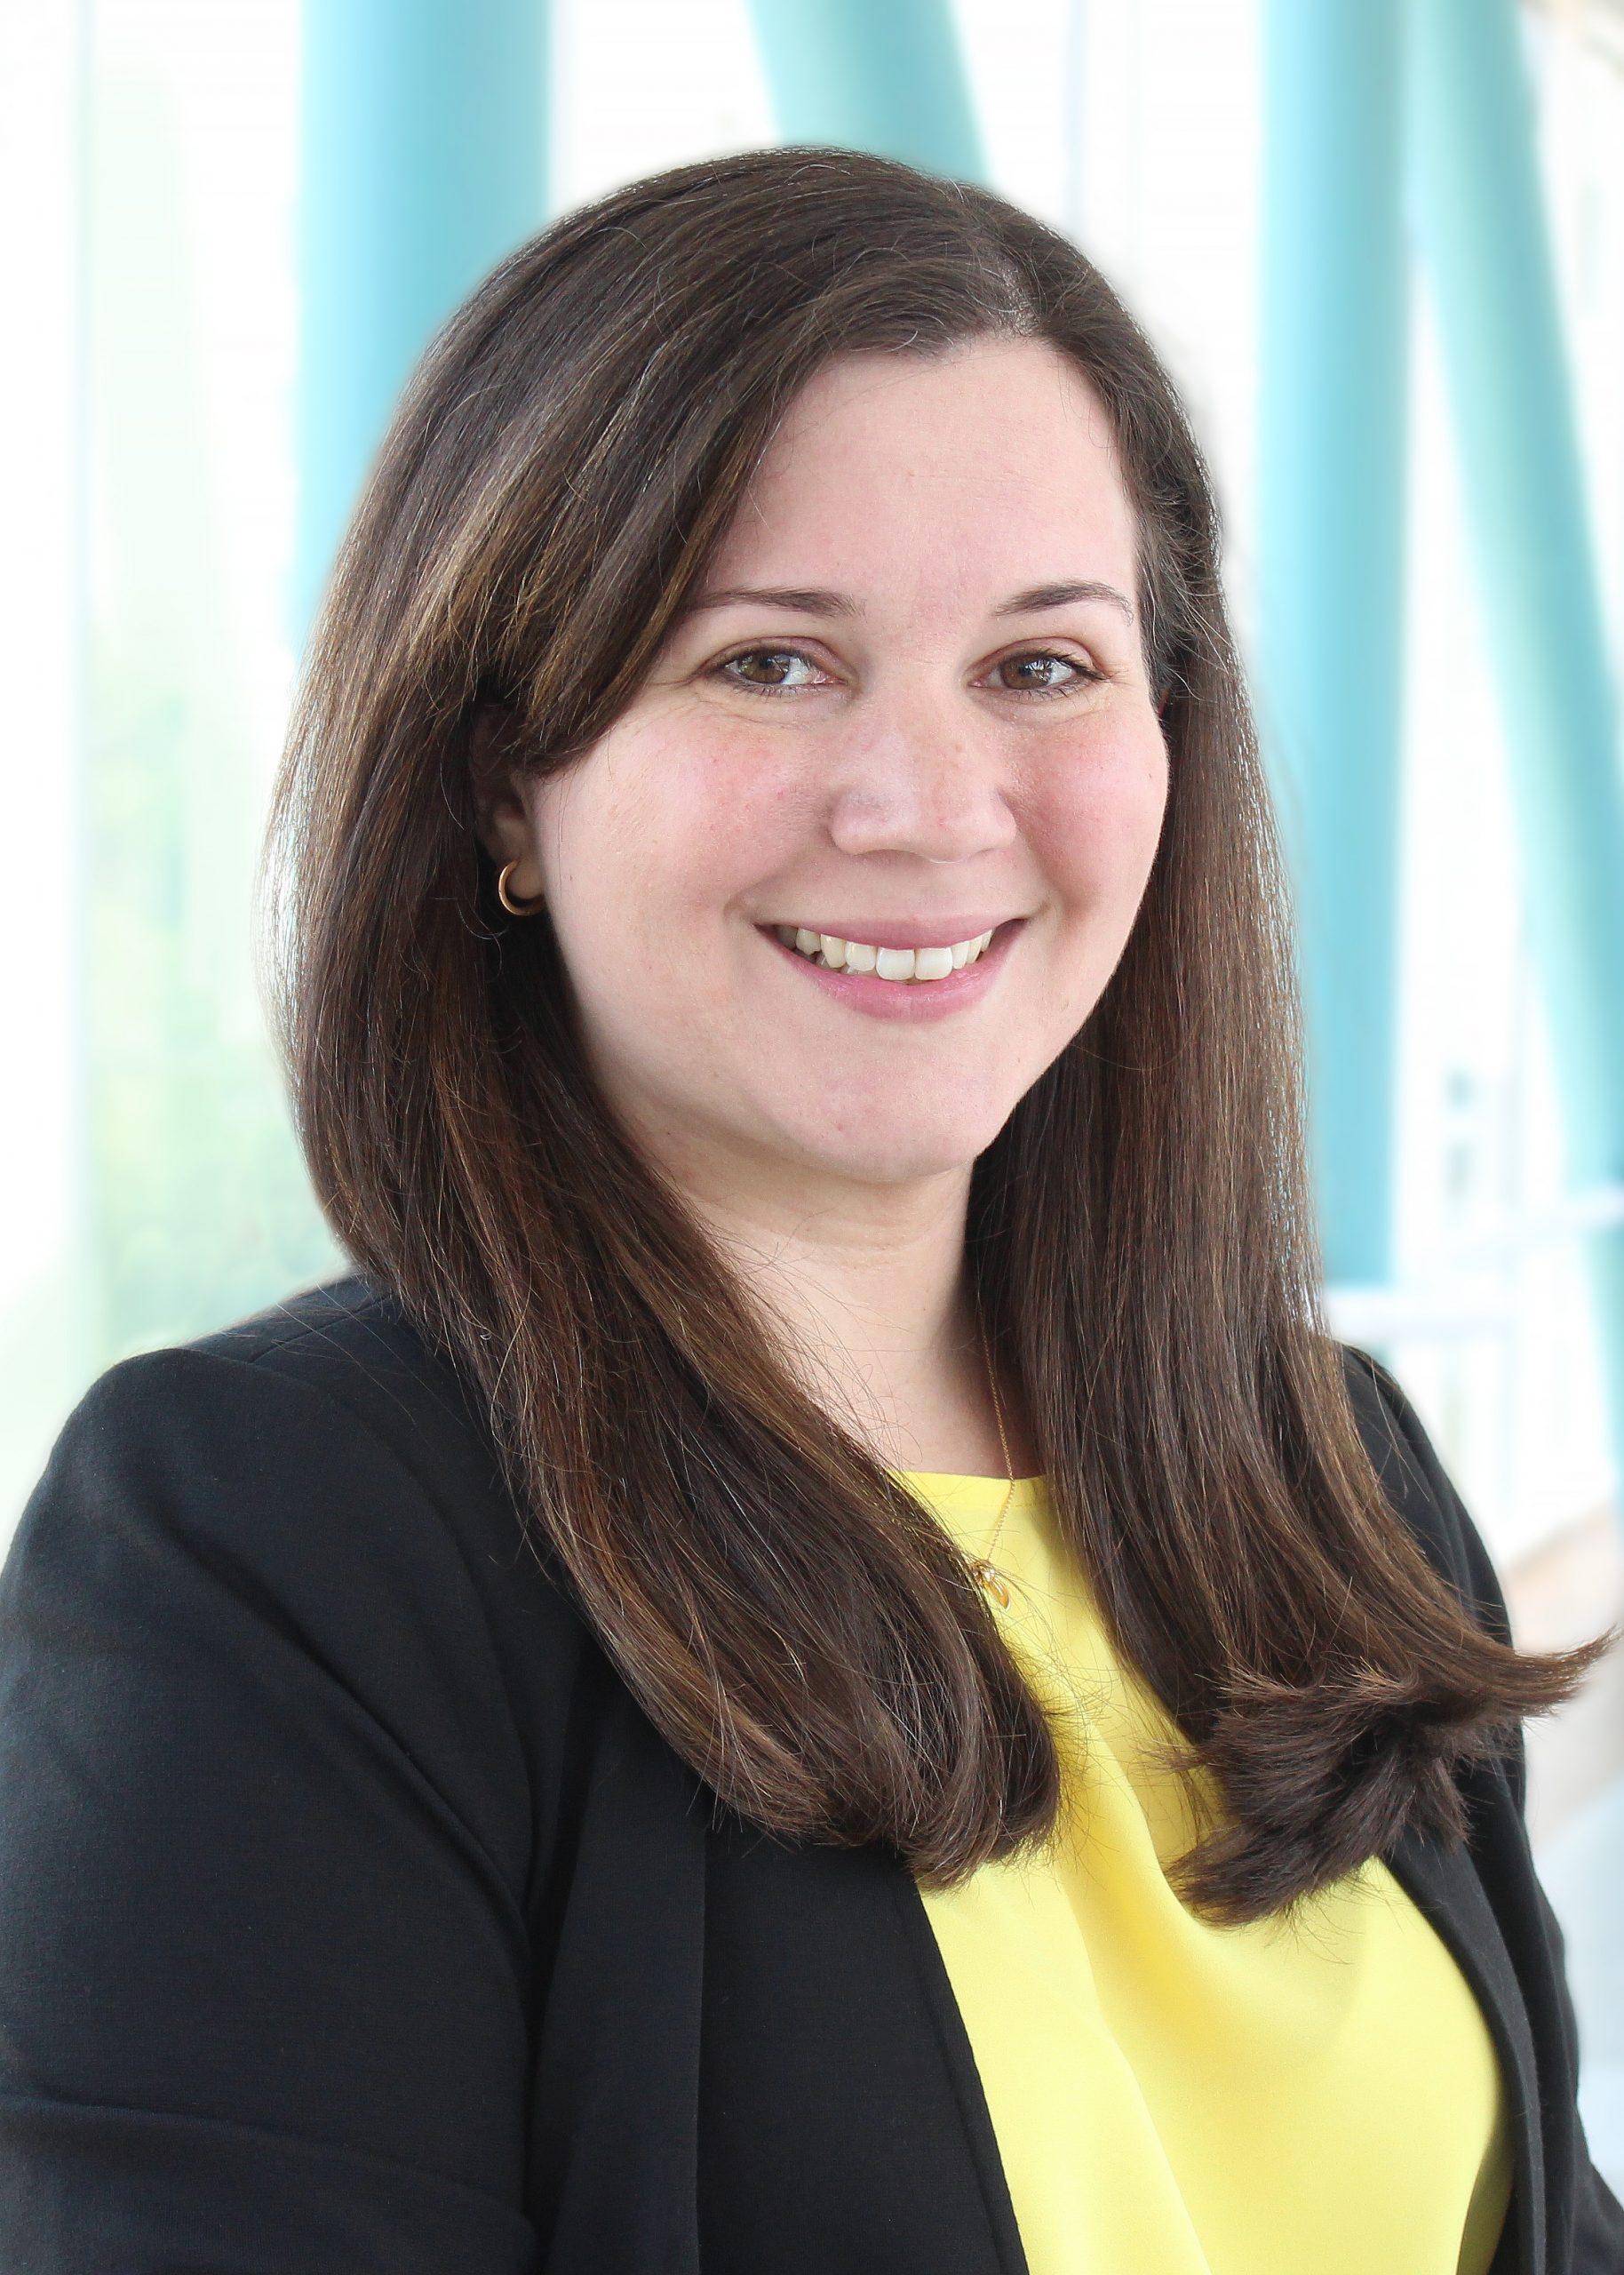 Elizabeth Ortiz-González, Ph.D.